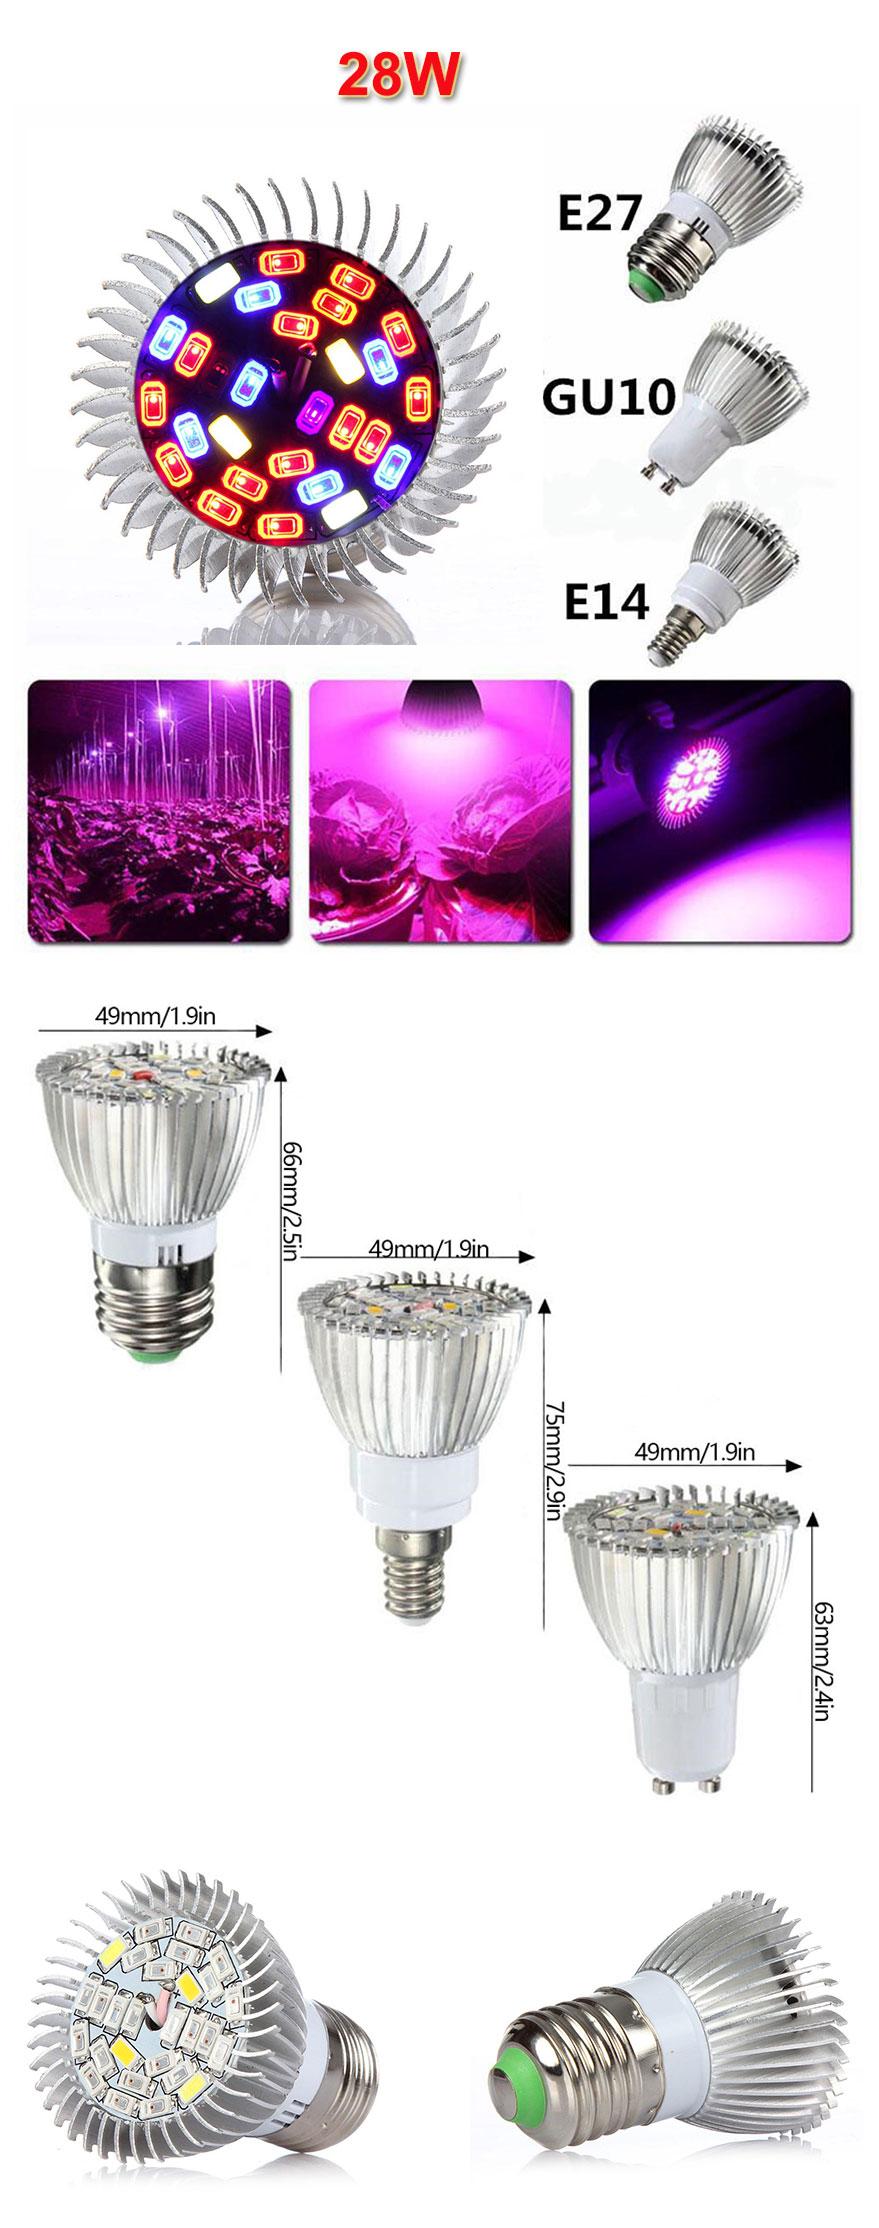 />LED Pflanzenlampe E14 PREMIUM 80 LED/'s 18W Anzucht med PflanzenLeuchten Hanf